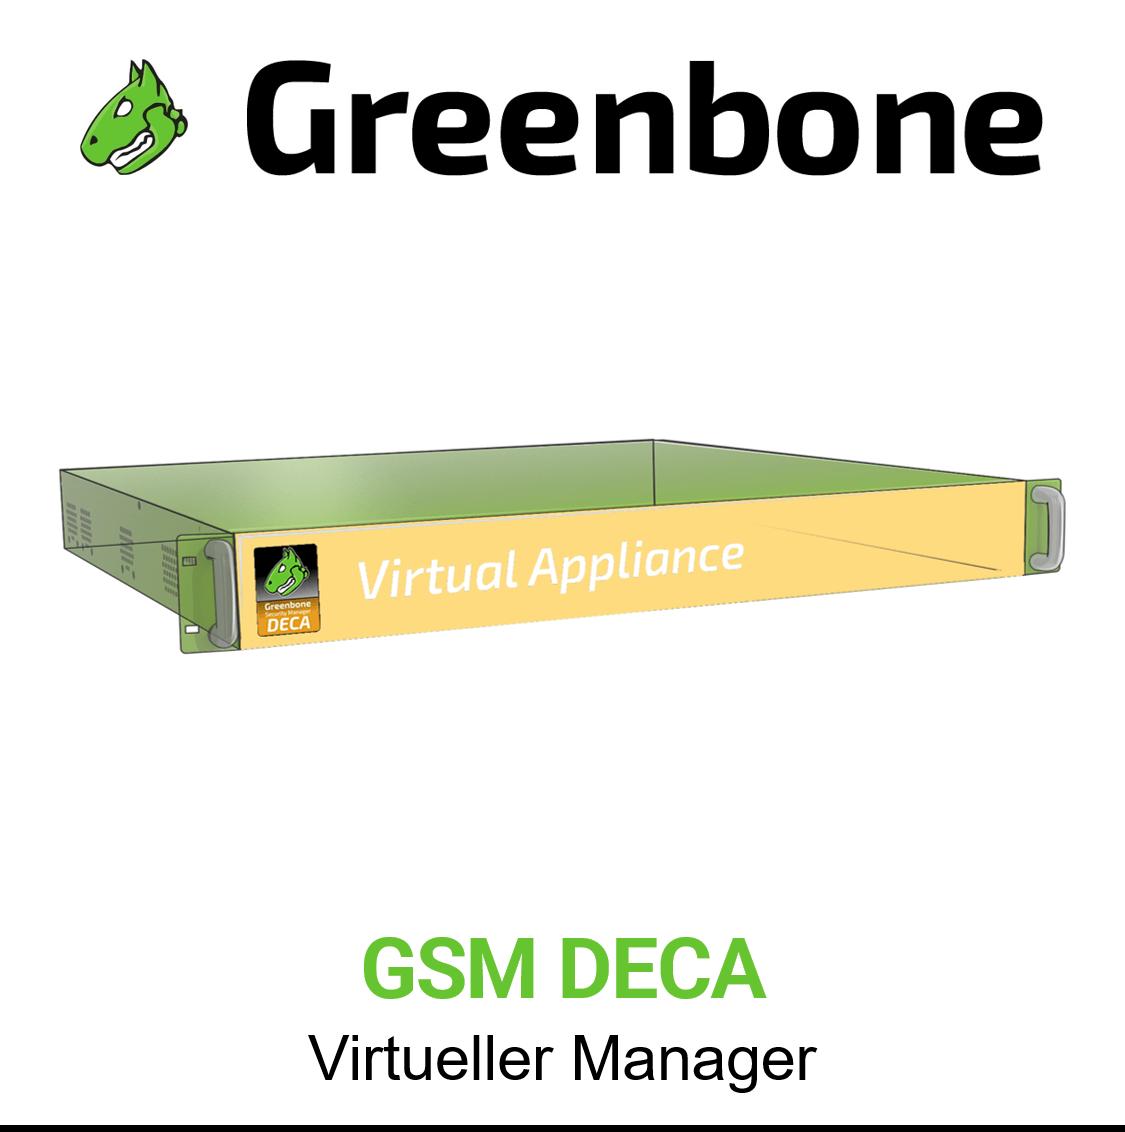 Greenbone GSM DECA Virtuelle Appliance